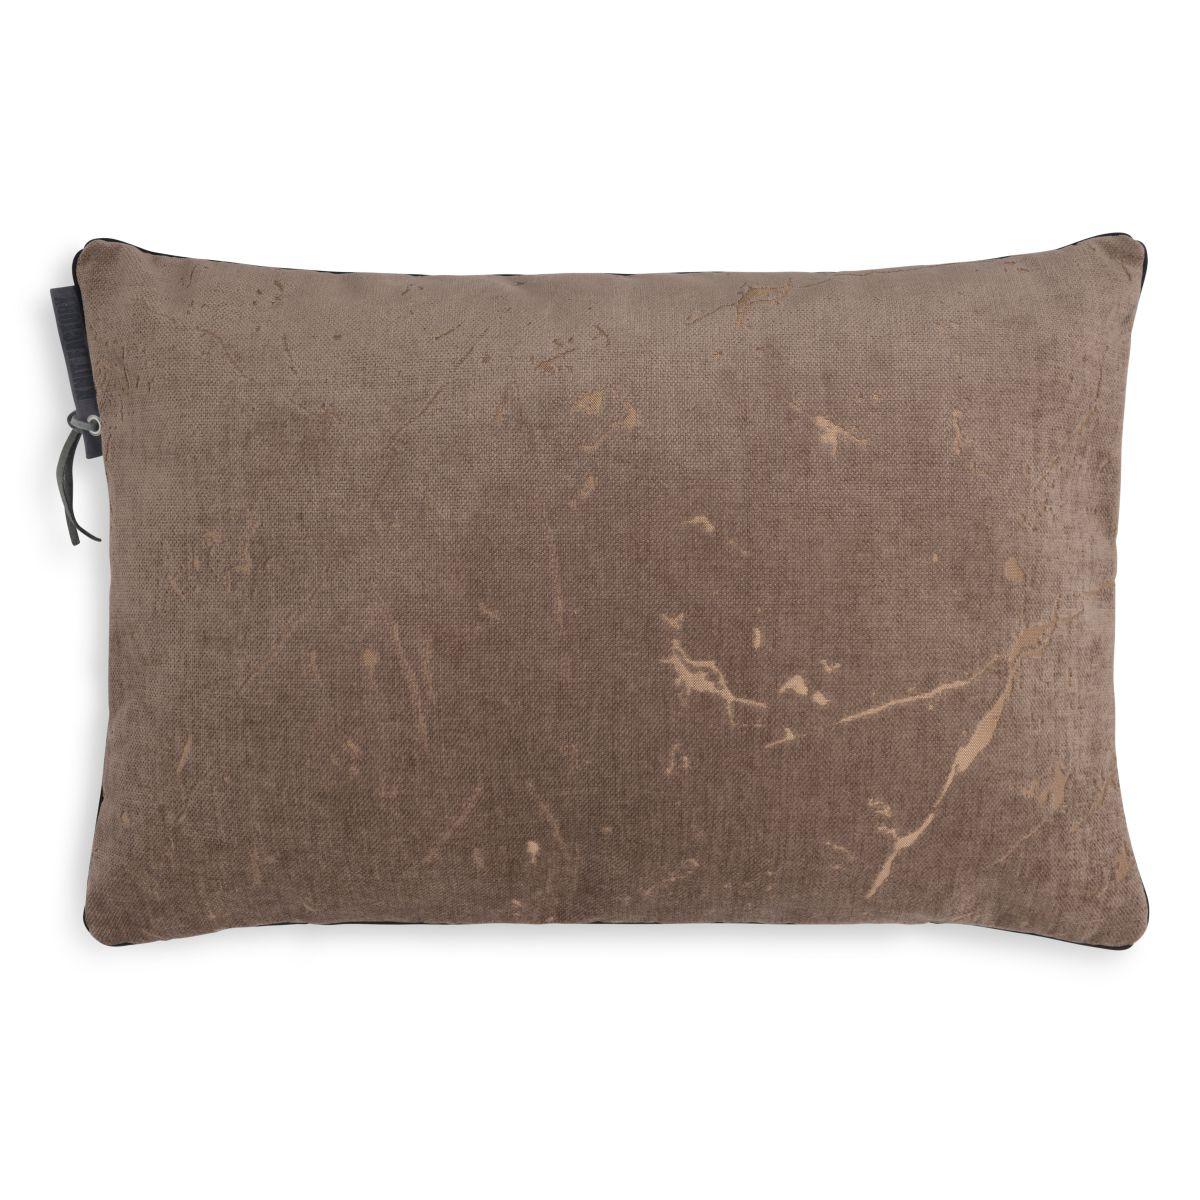 james cushion taupe 60x40